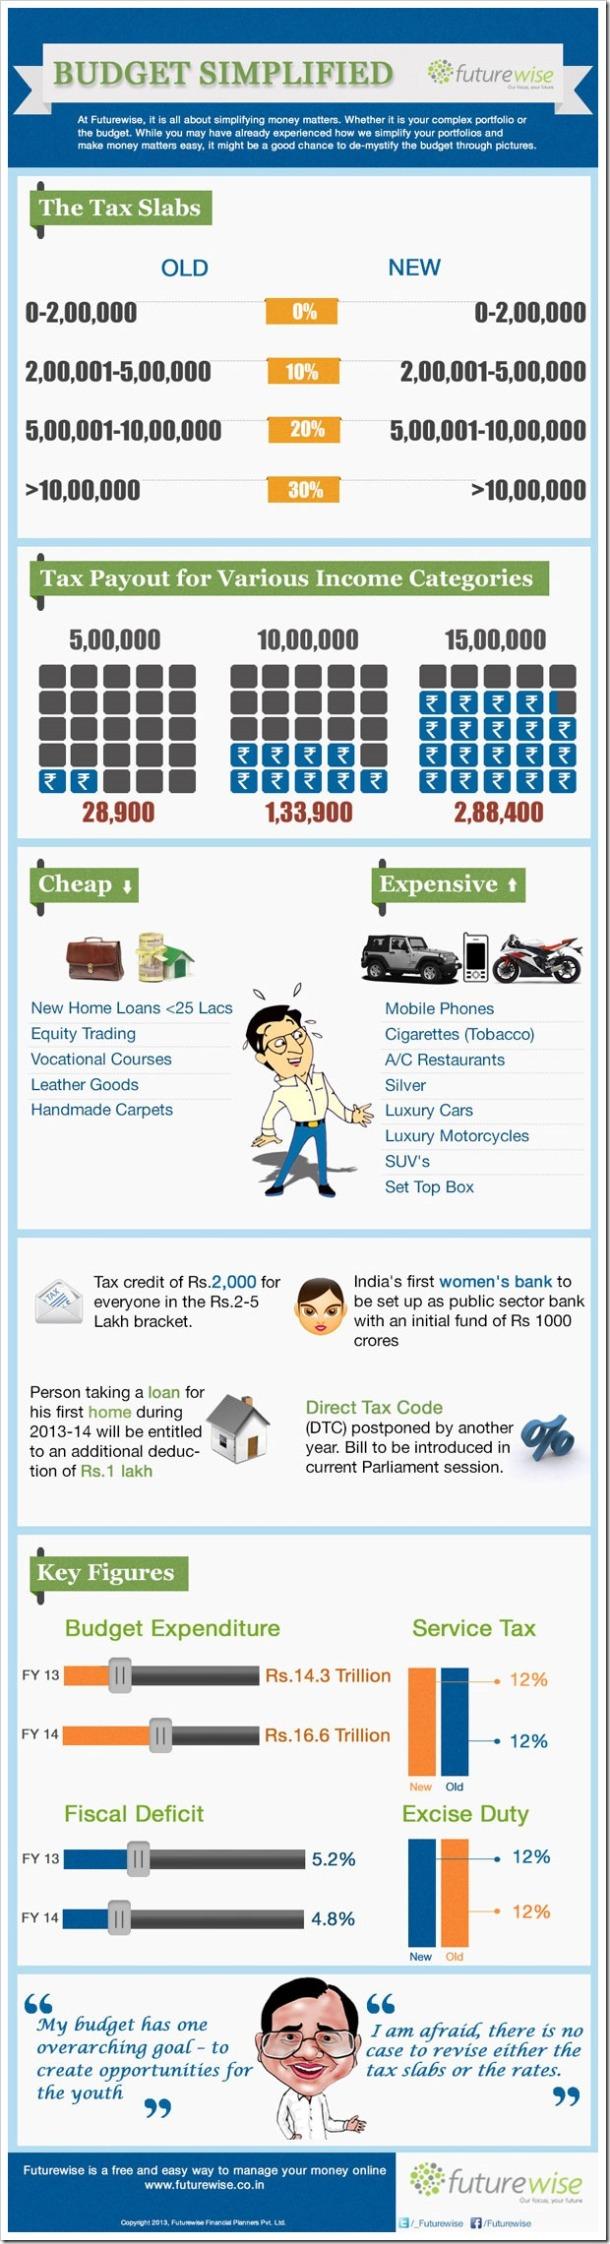 Budget 2013 Infographic